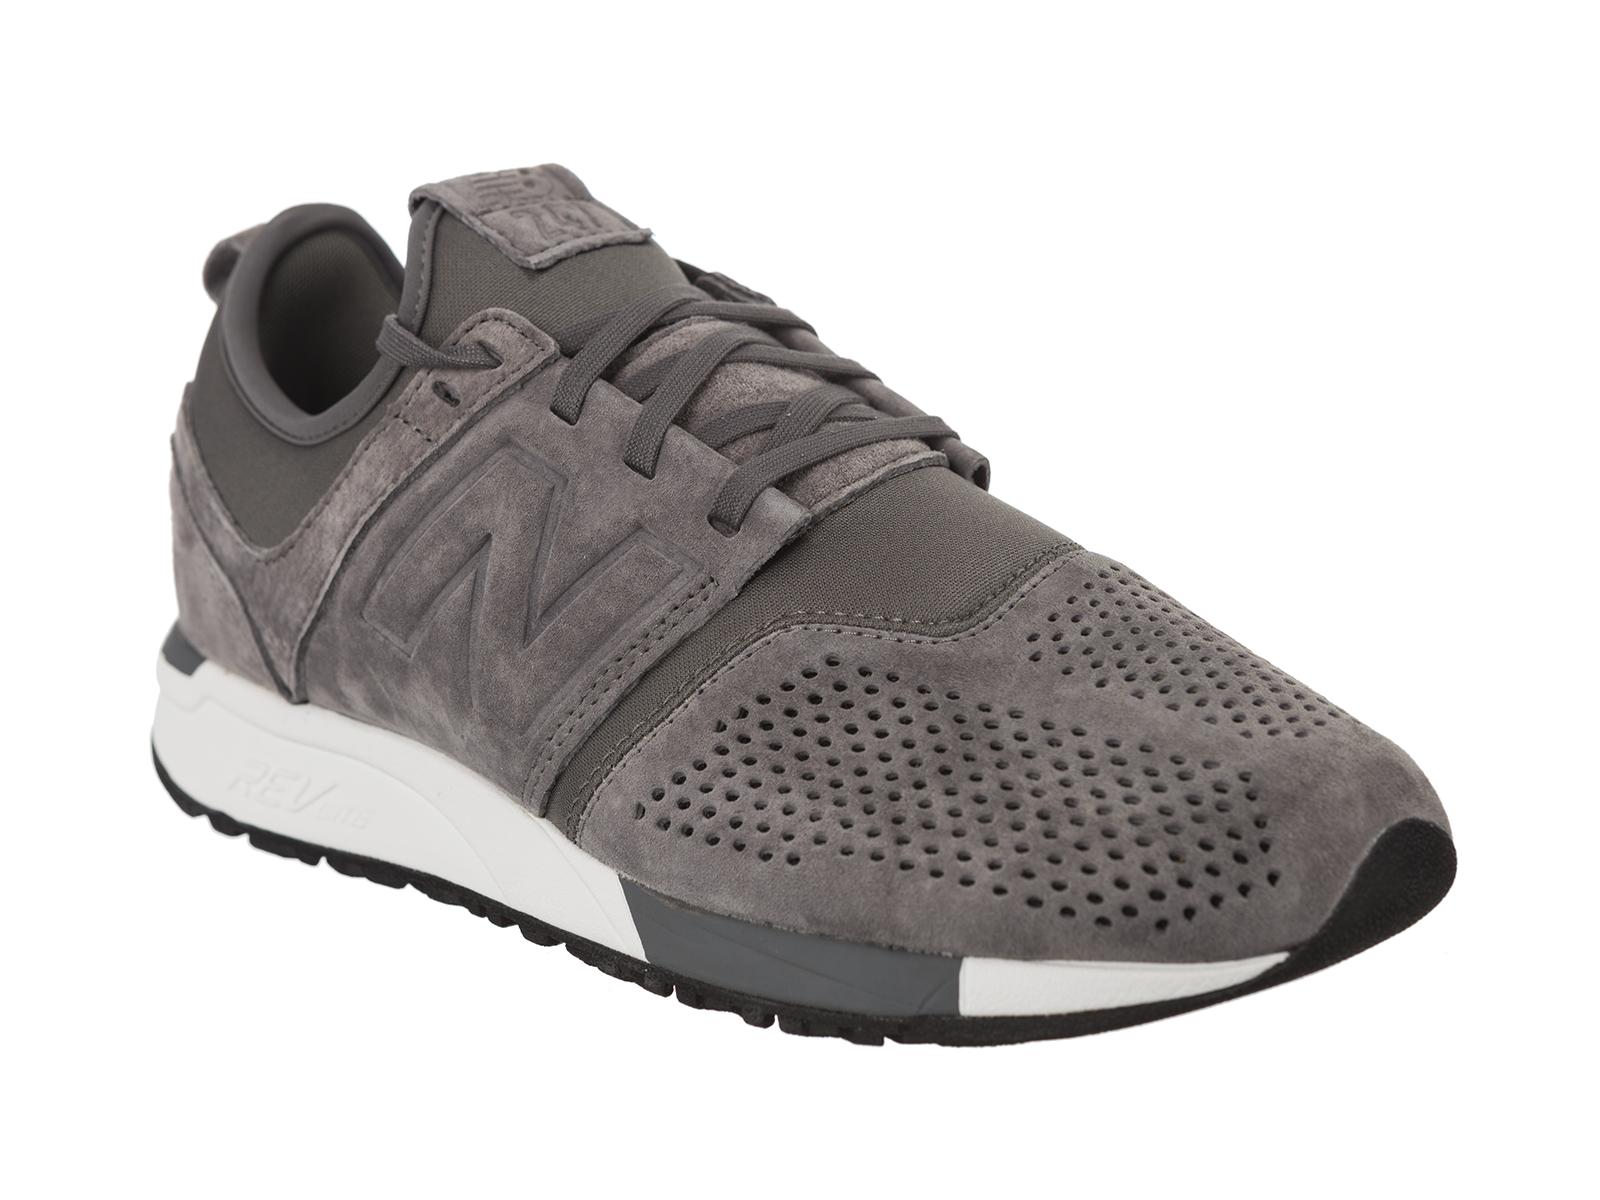 sneakers uomo inverno new balance